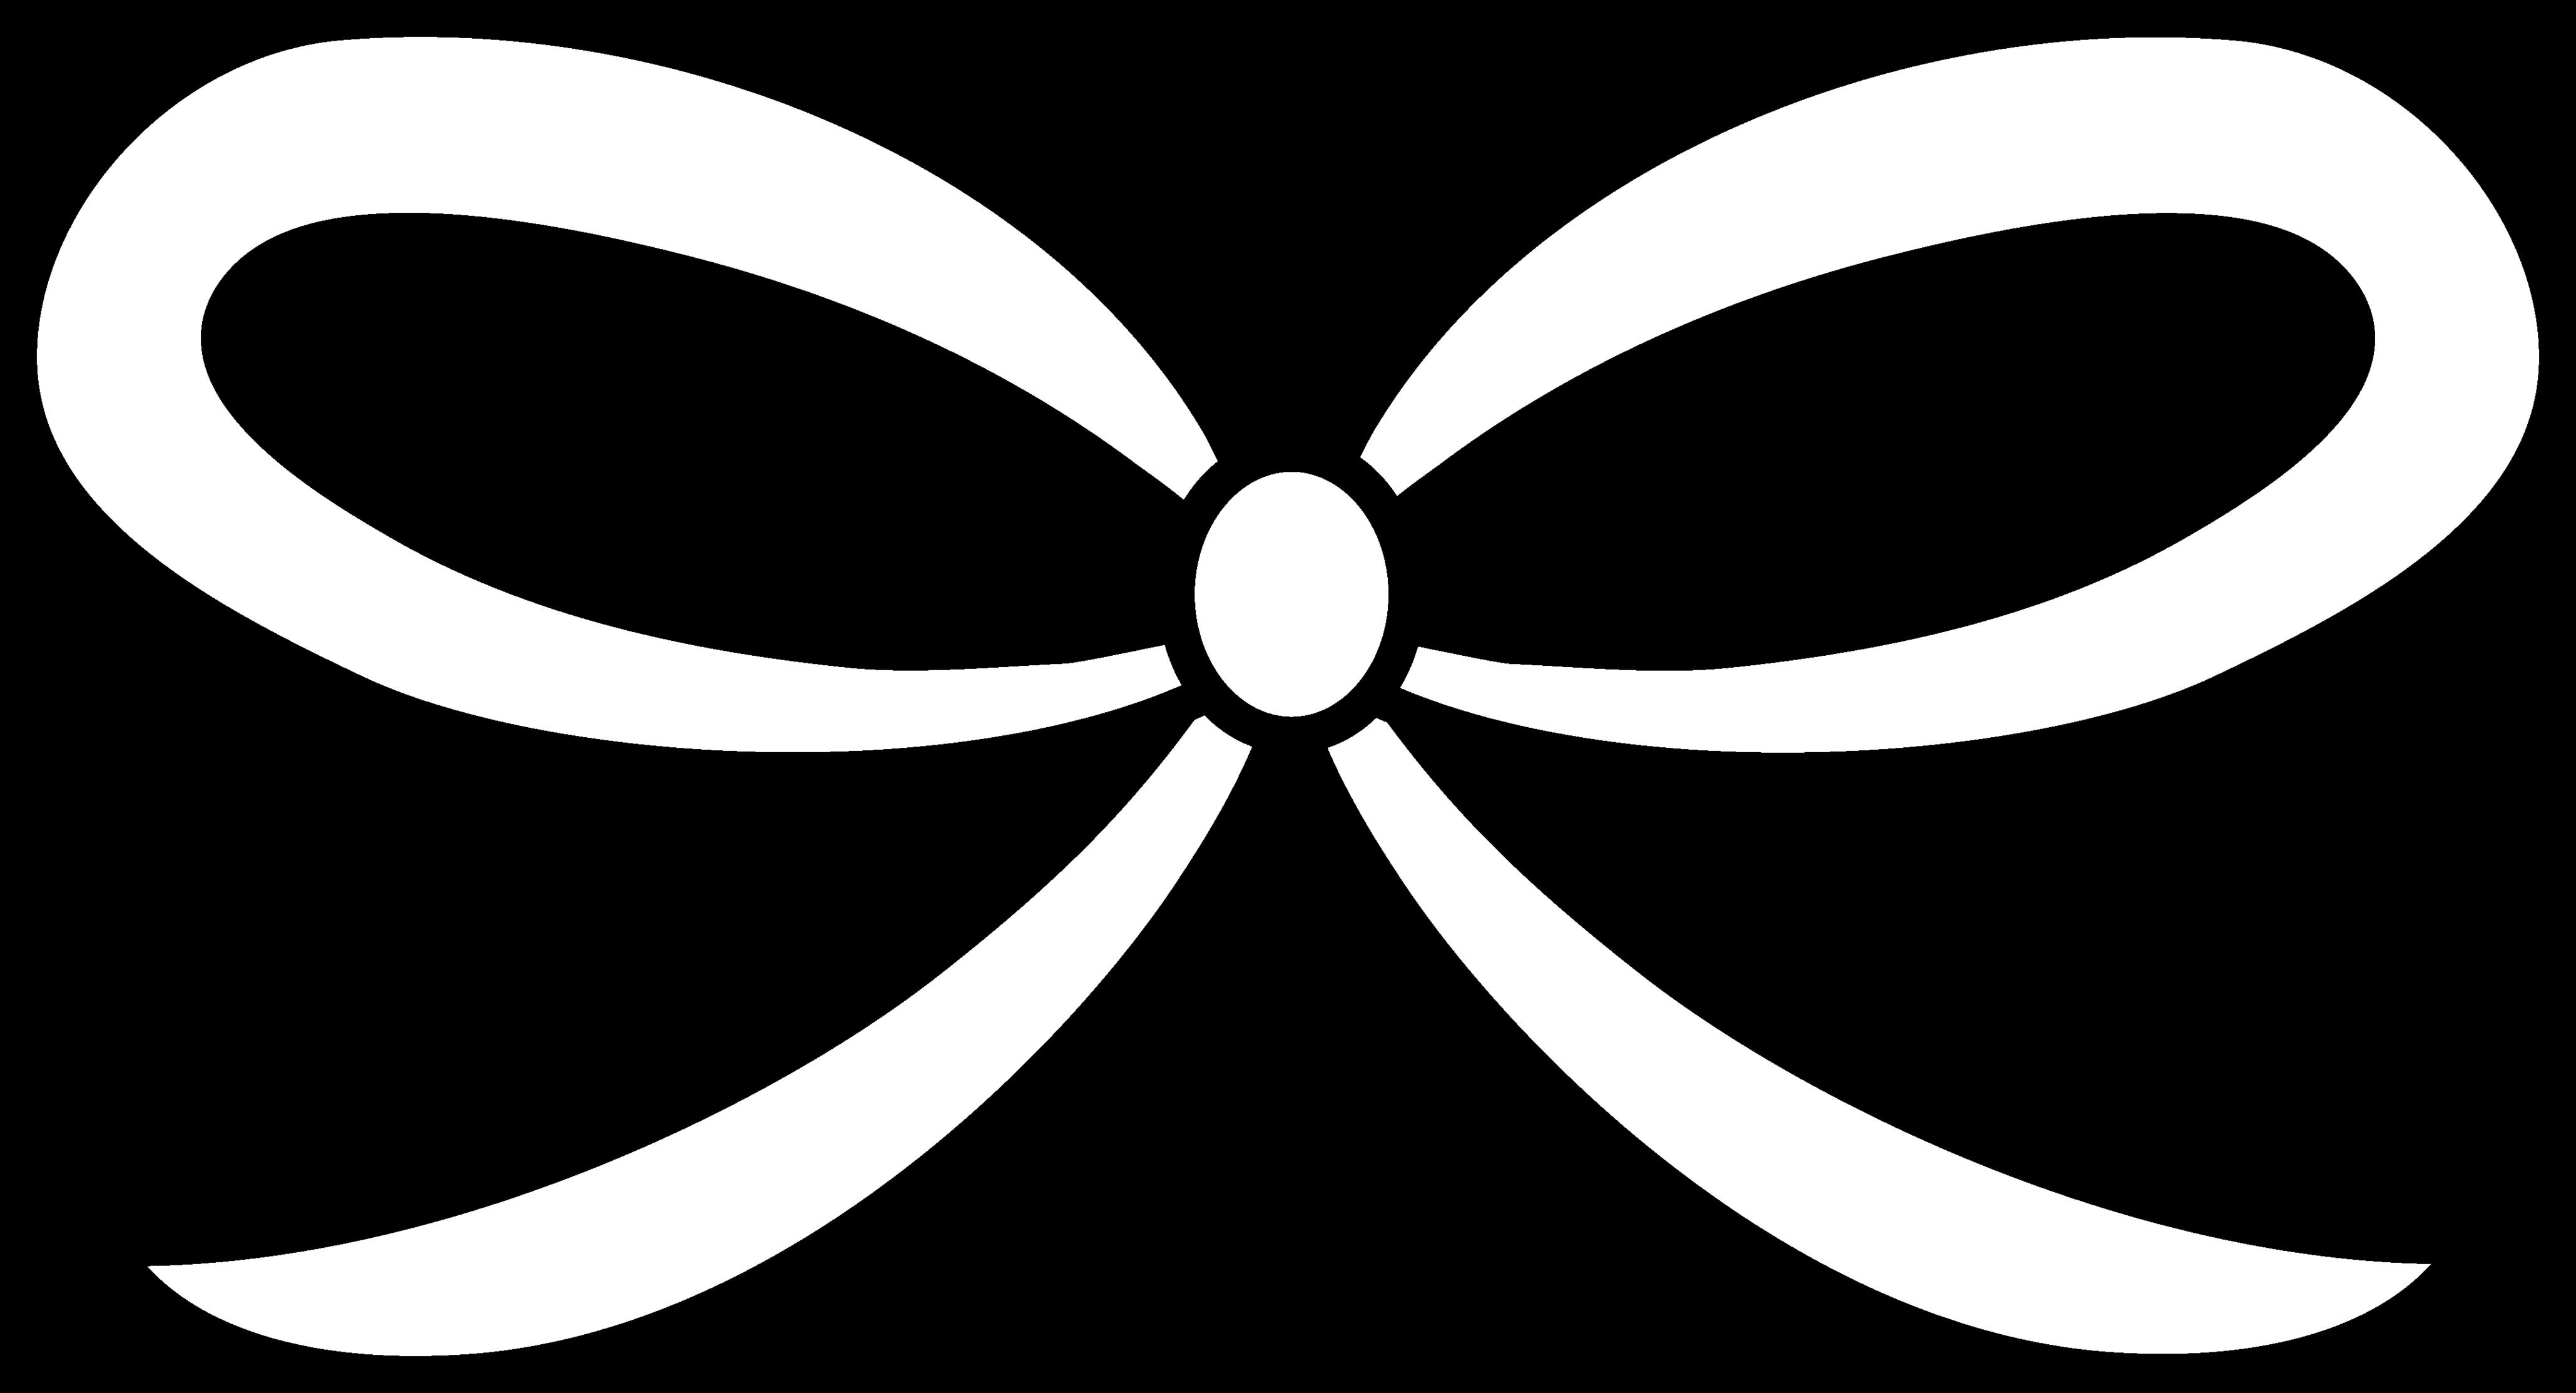 Ribbon clipart black and white.